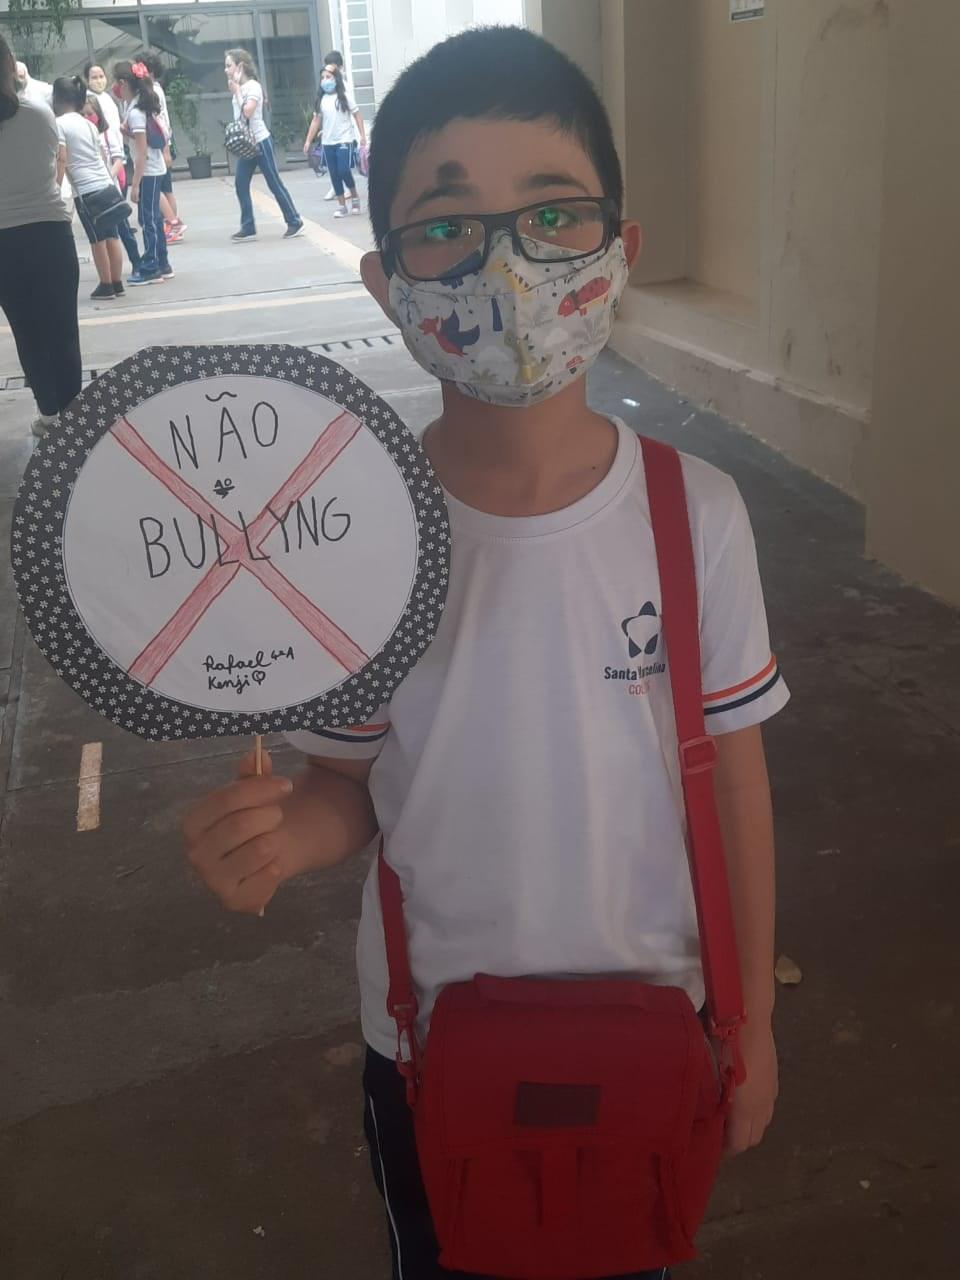 Bulliyng2021